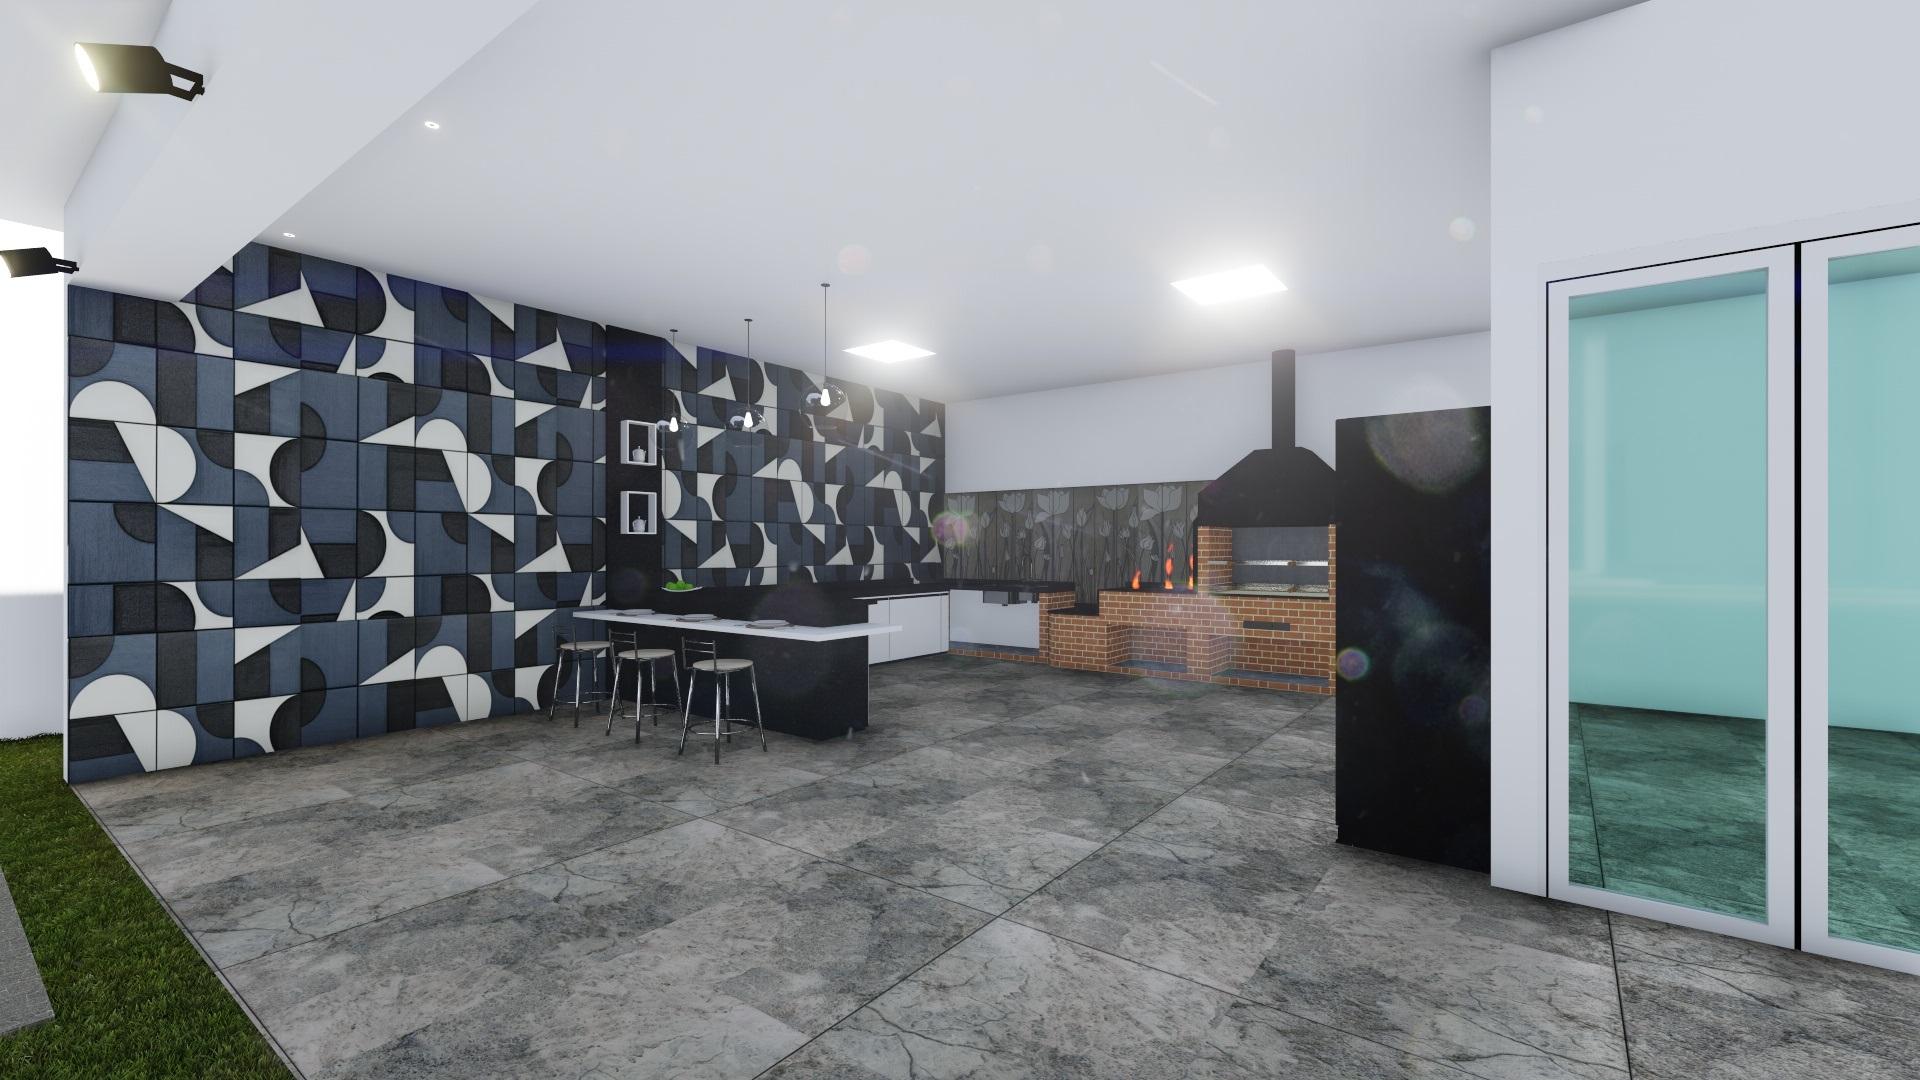 construção-projeto-condominio_alto_da_boa_vista_-_CAVB_(5)